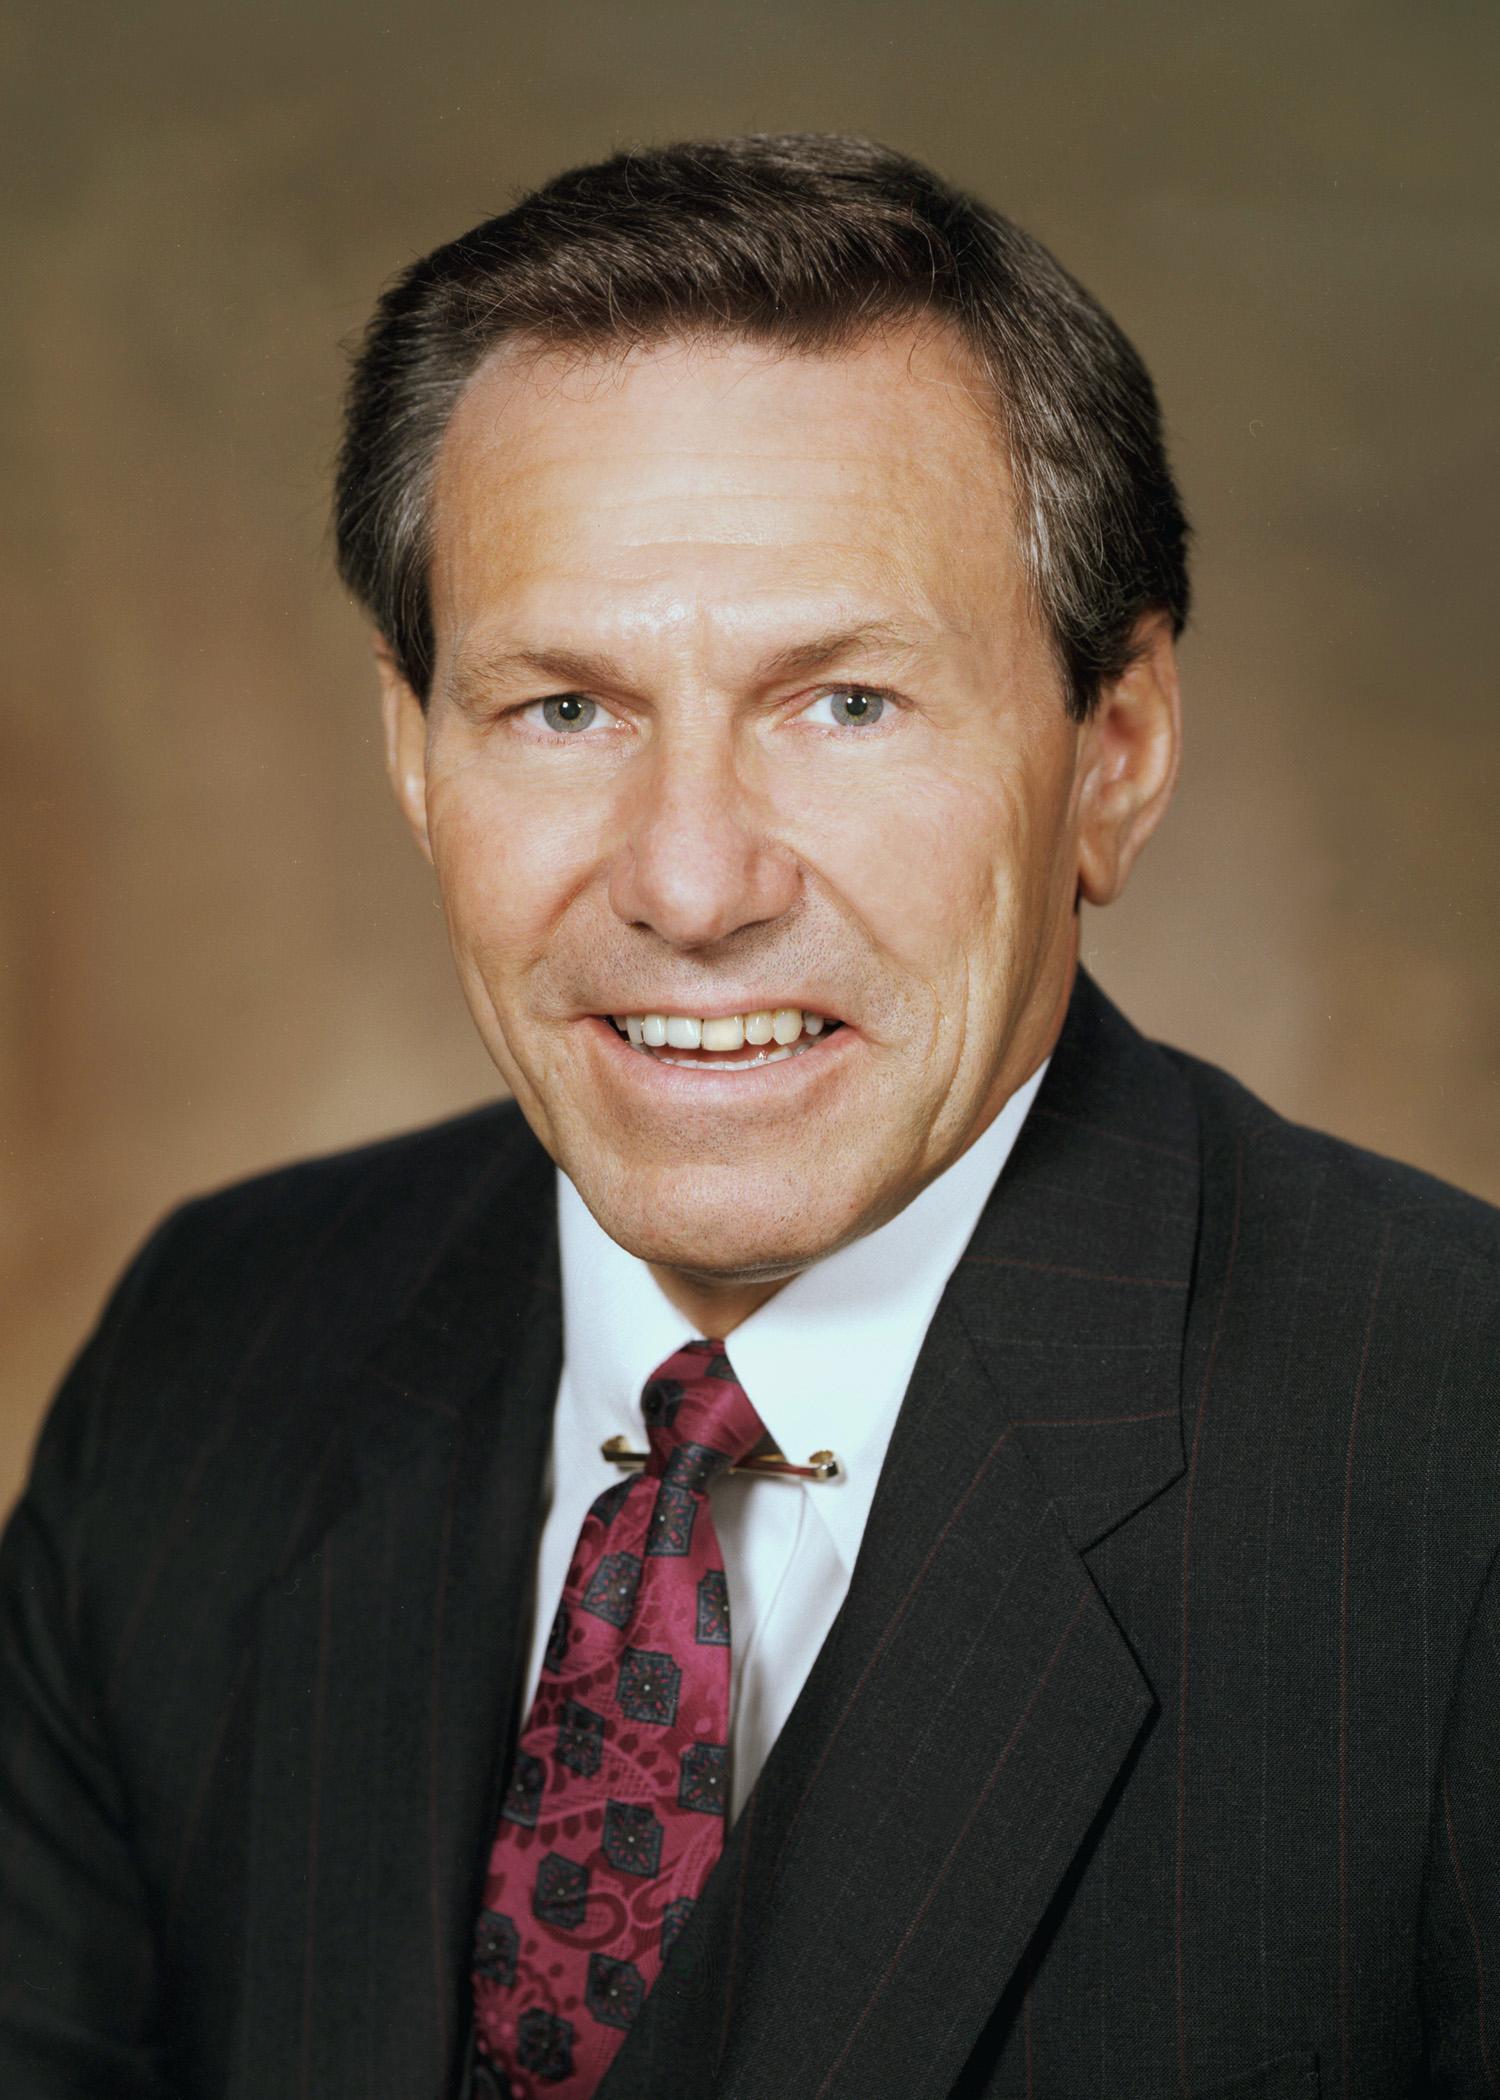 Lloyd E. Reuss